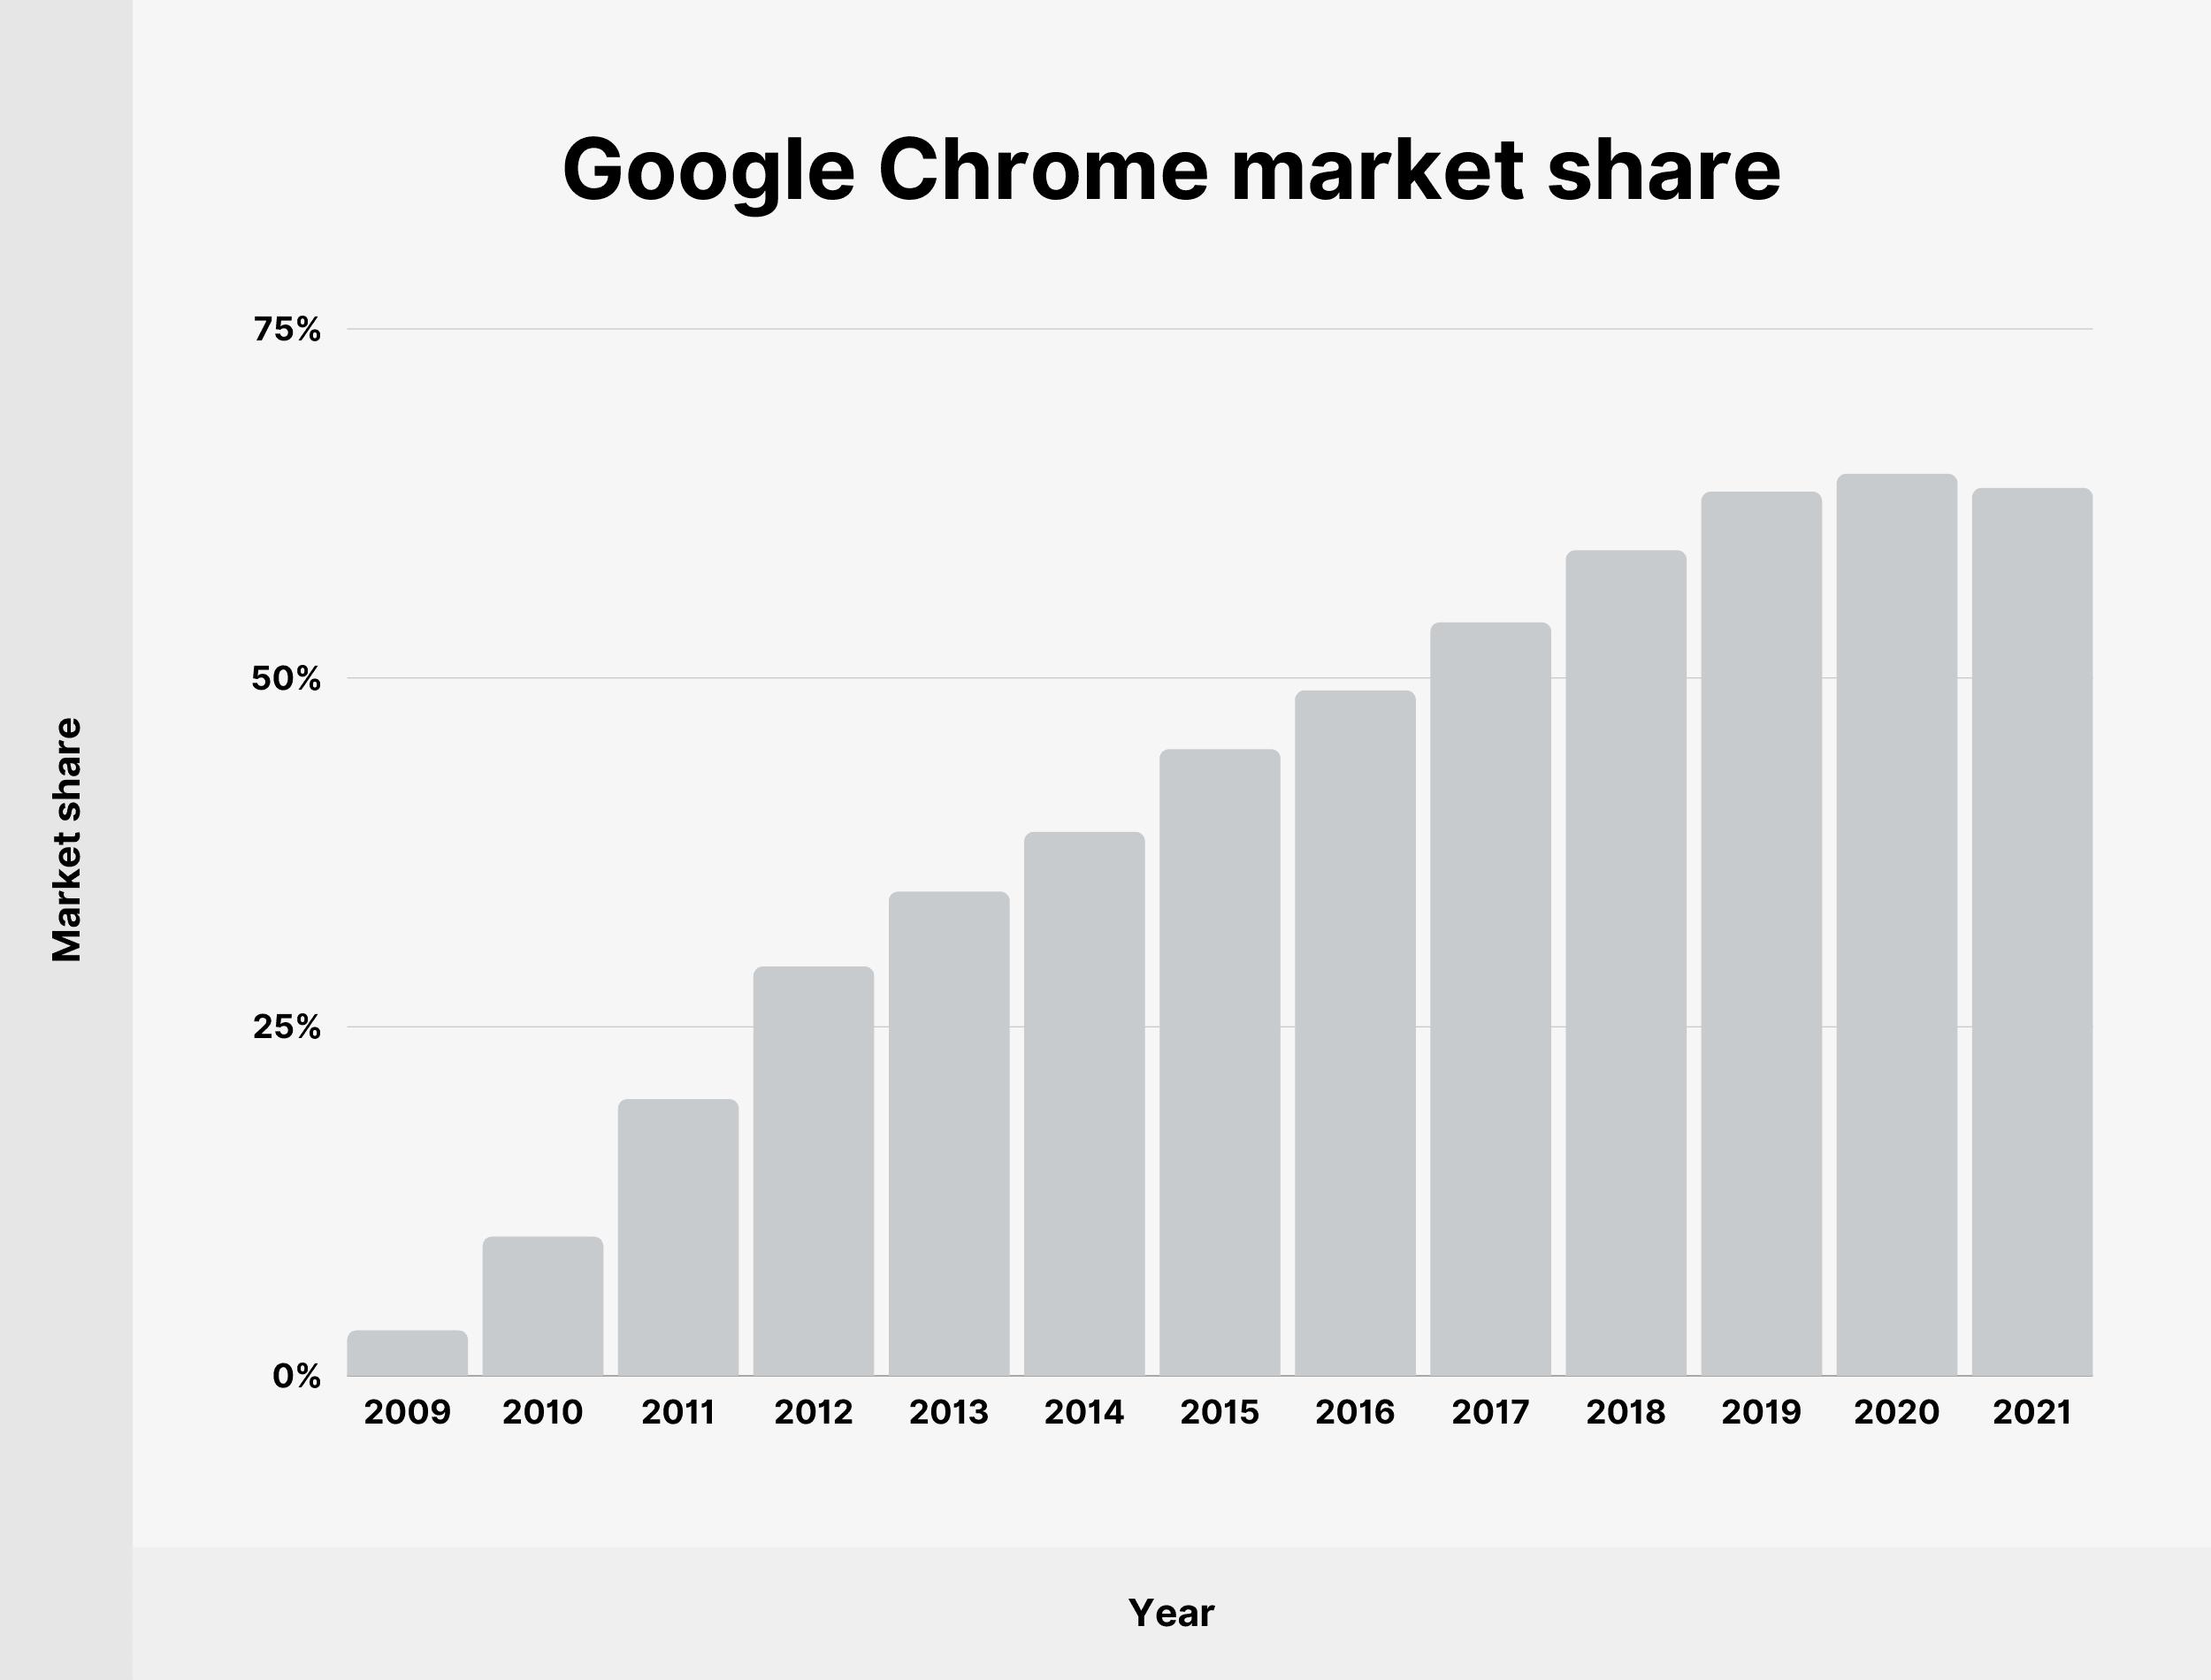 Google Chrome market share